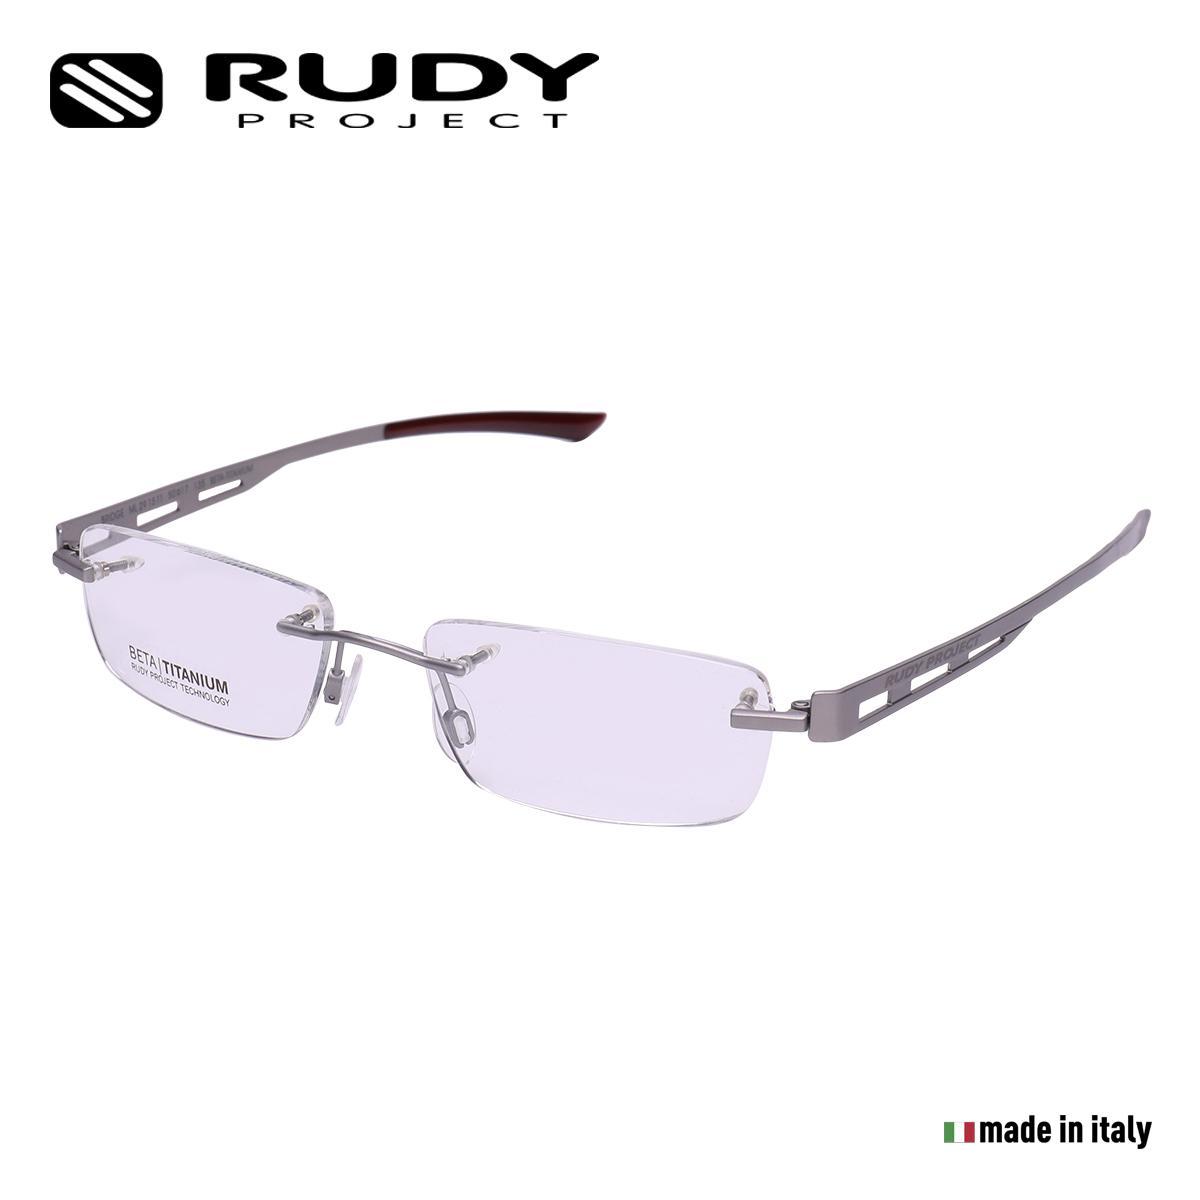 8219527de9 Rudy Project Bridge 27 Rimless Optical Eyewear in Titanium Palladium with  Demo Lenses ML2715T1 (Size